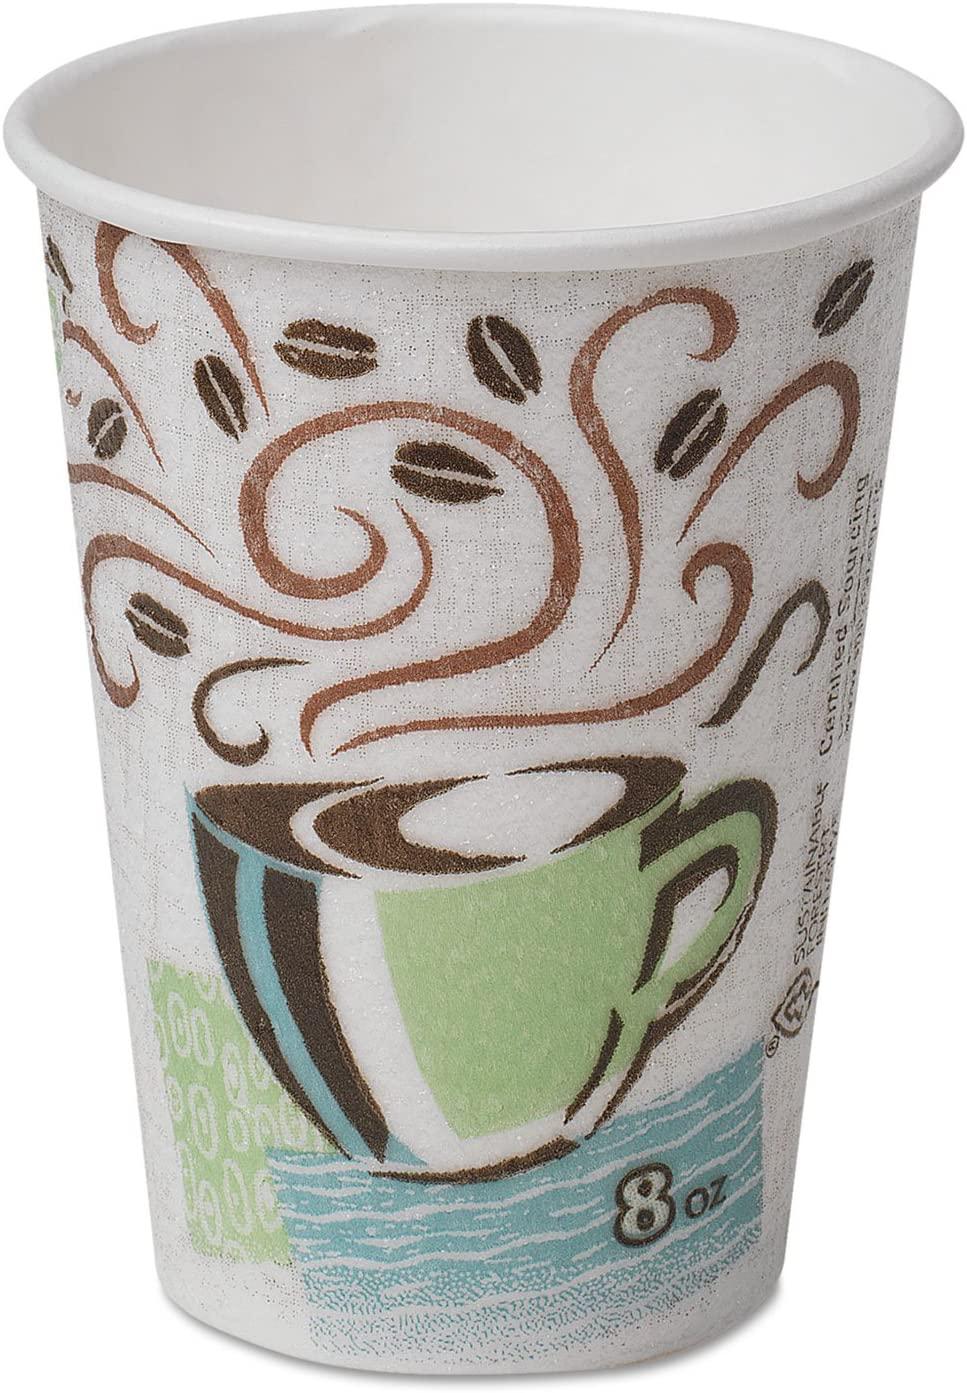 Dixie PerfecTouch Hot Cup - 8oz - 1000 / Carton